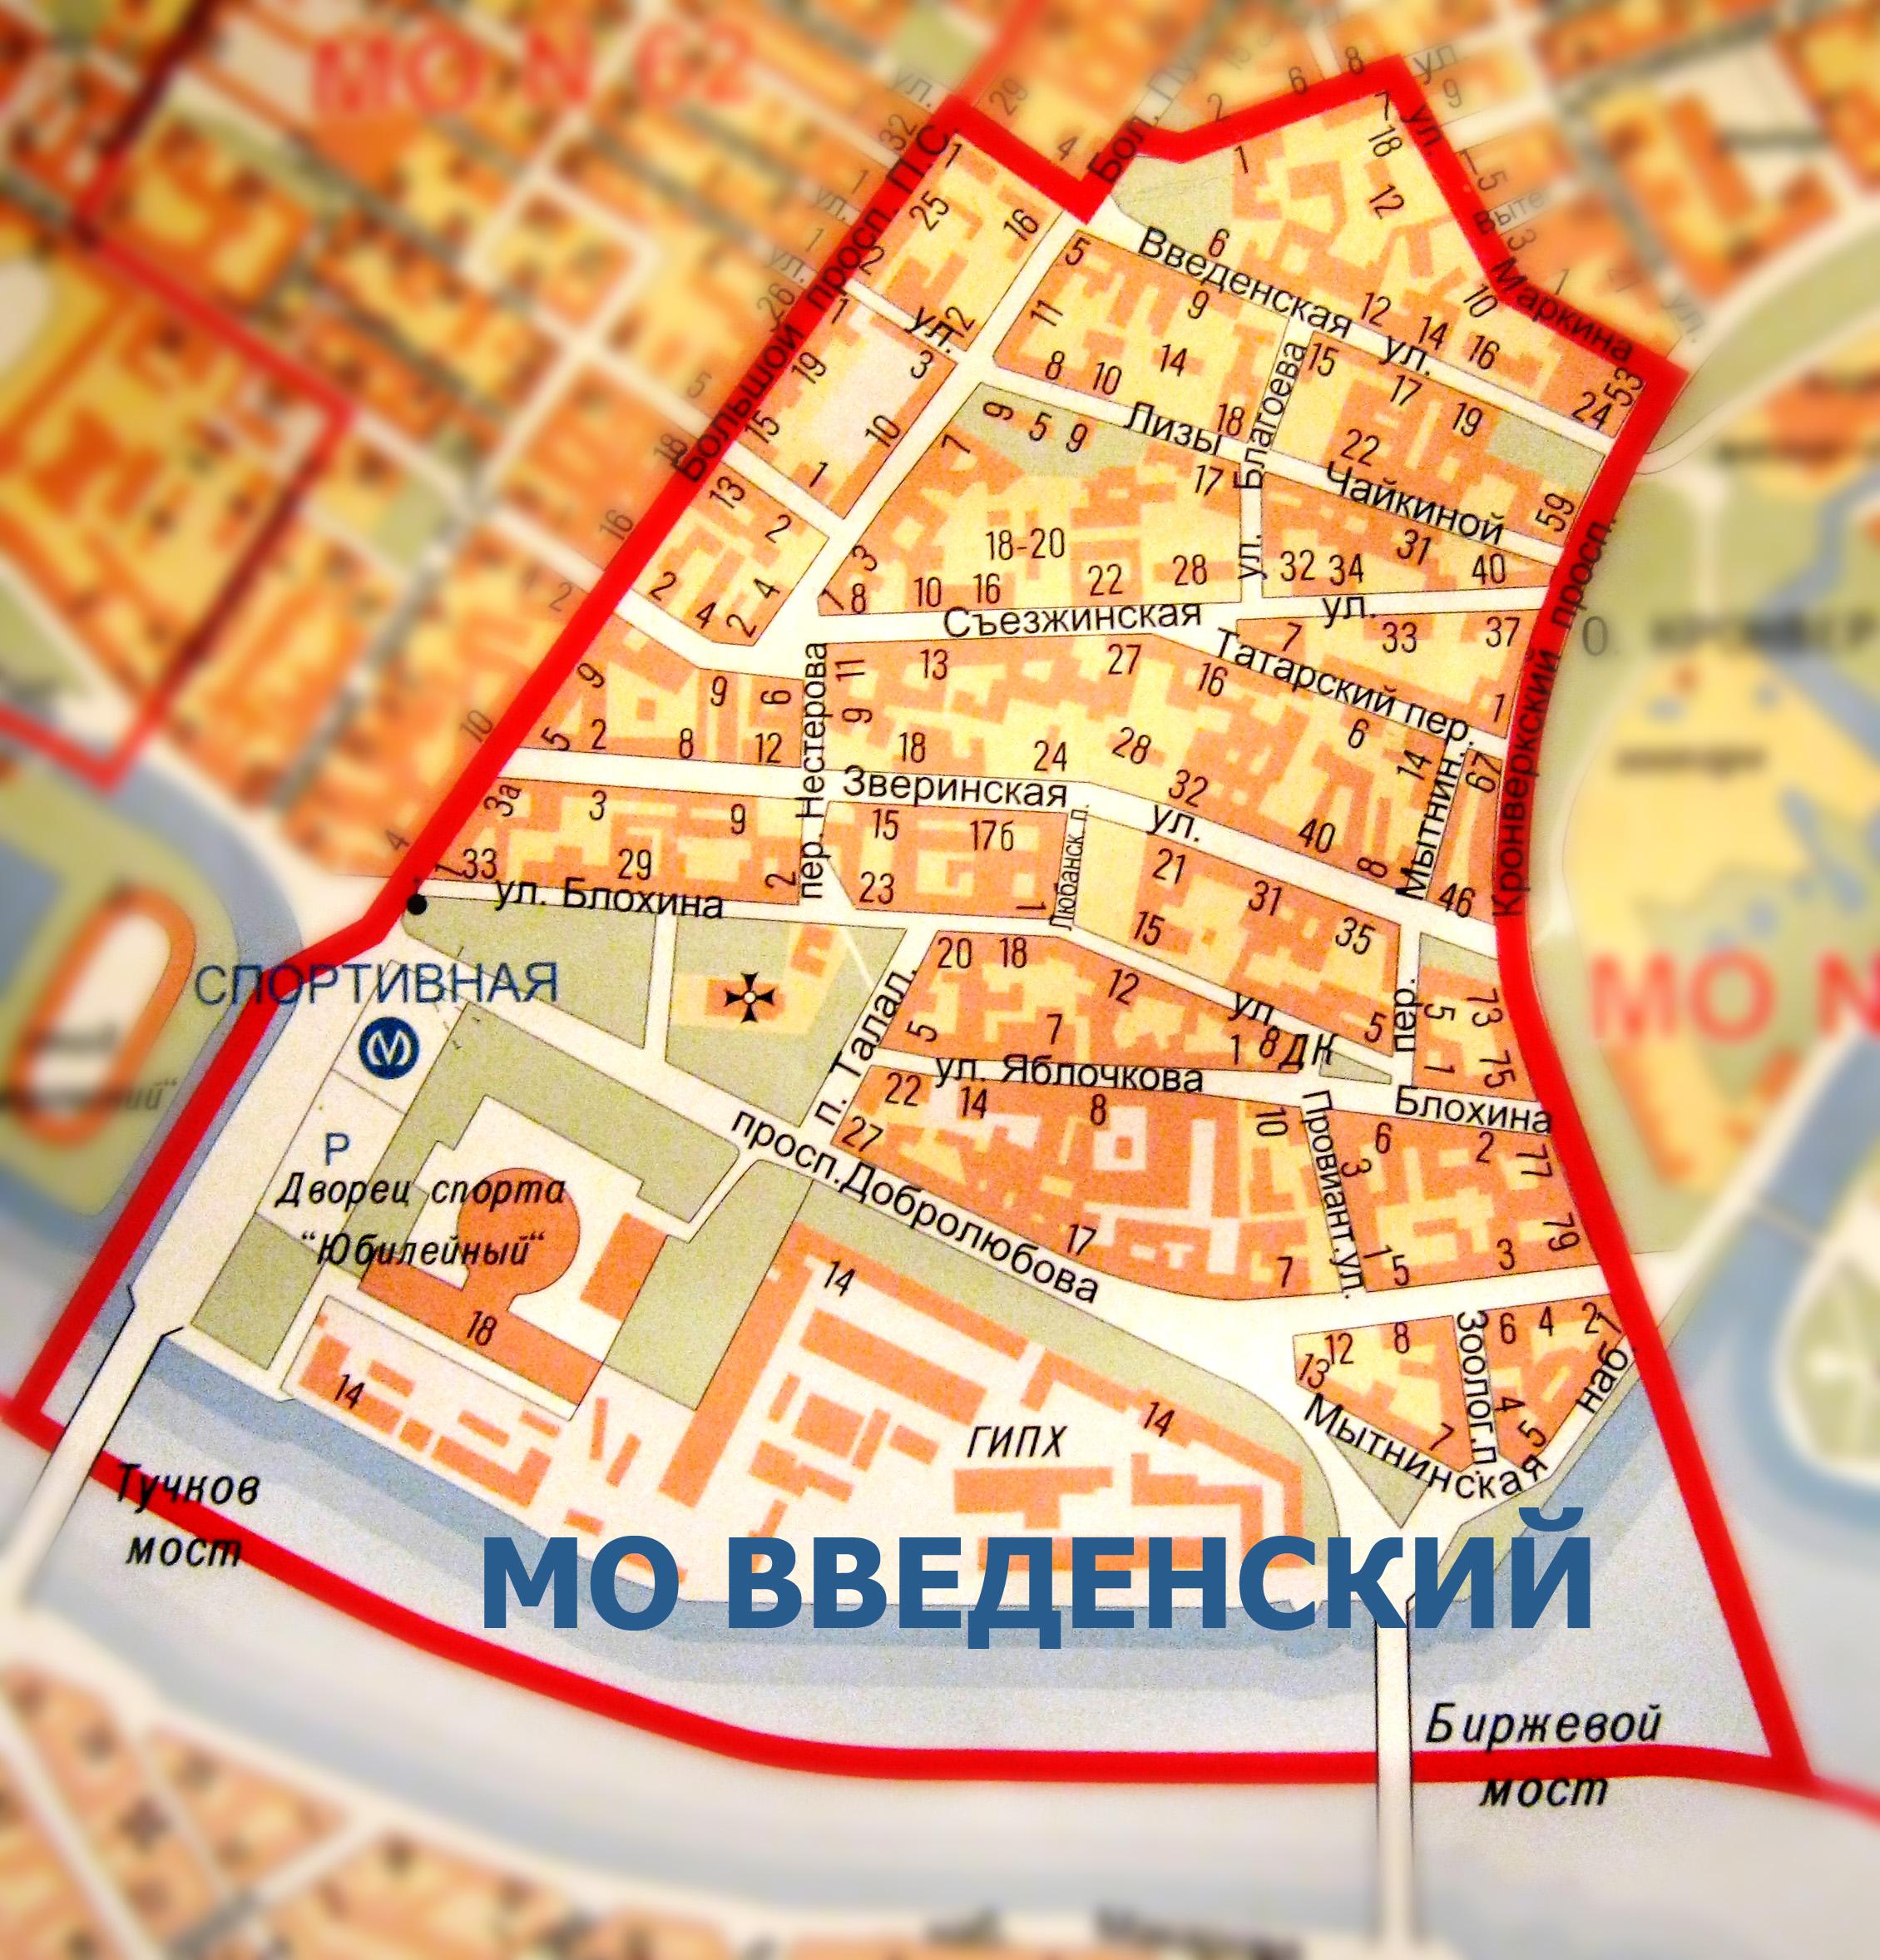 "фото ЗакС политика Прокуратура заинтересовалась МО ""Введенский"""